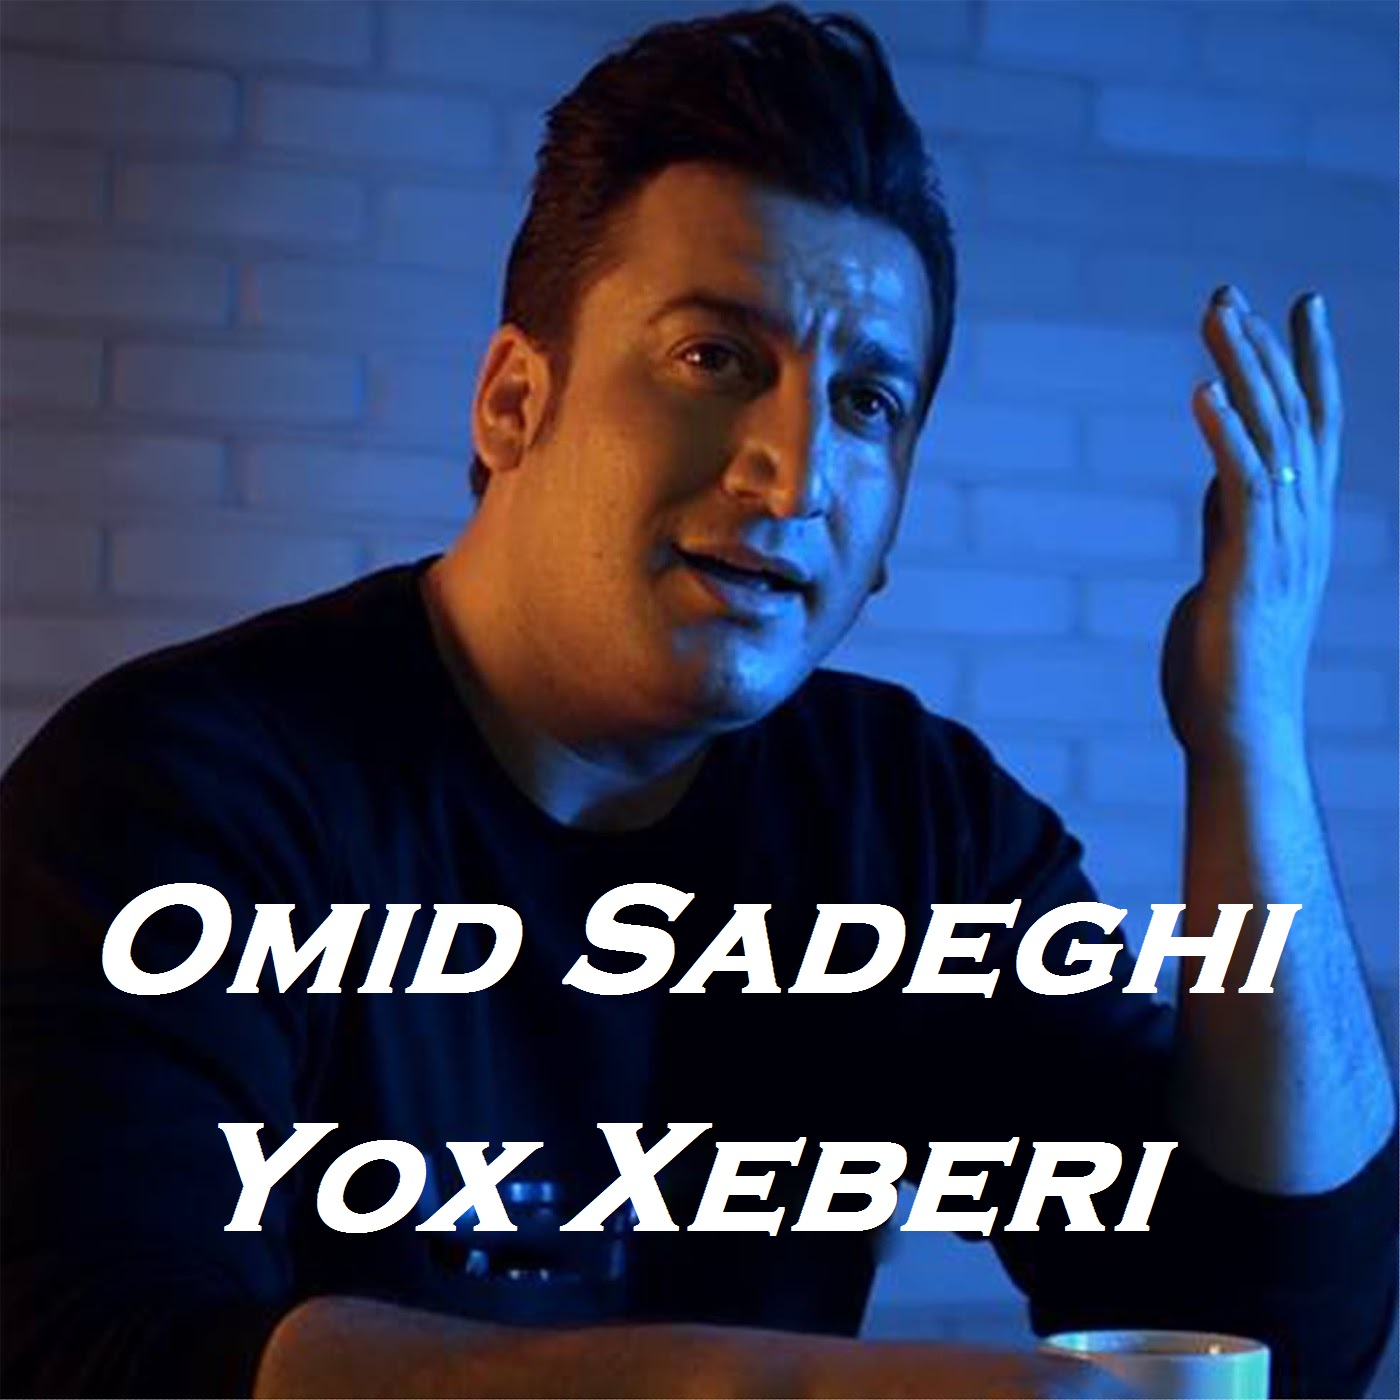 https://s18.picofile.com/file/8437191984/12Omid_Sadeghi_Yox_Xeberi.jpg